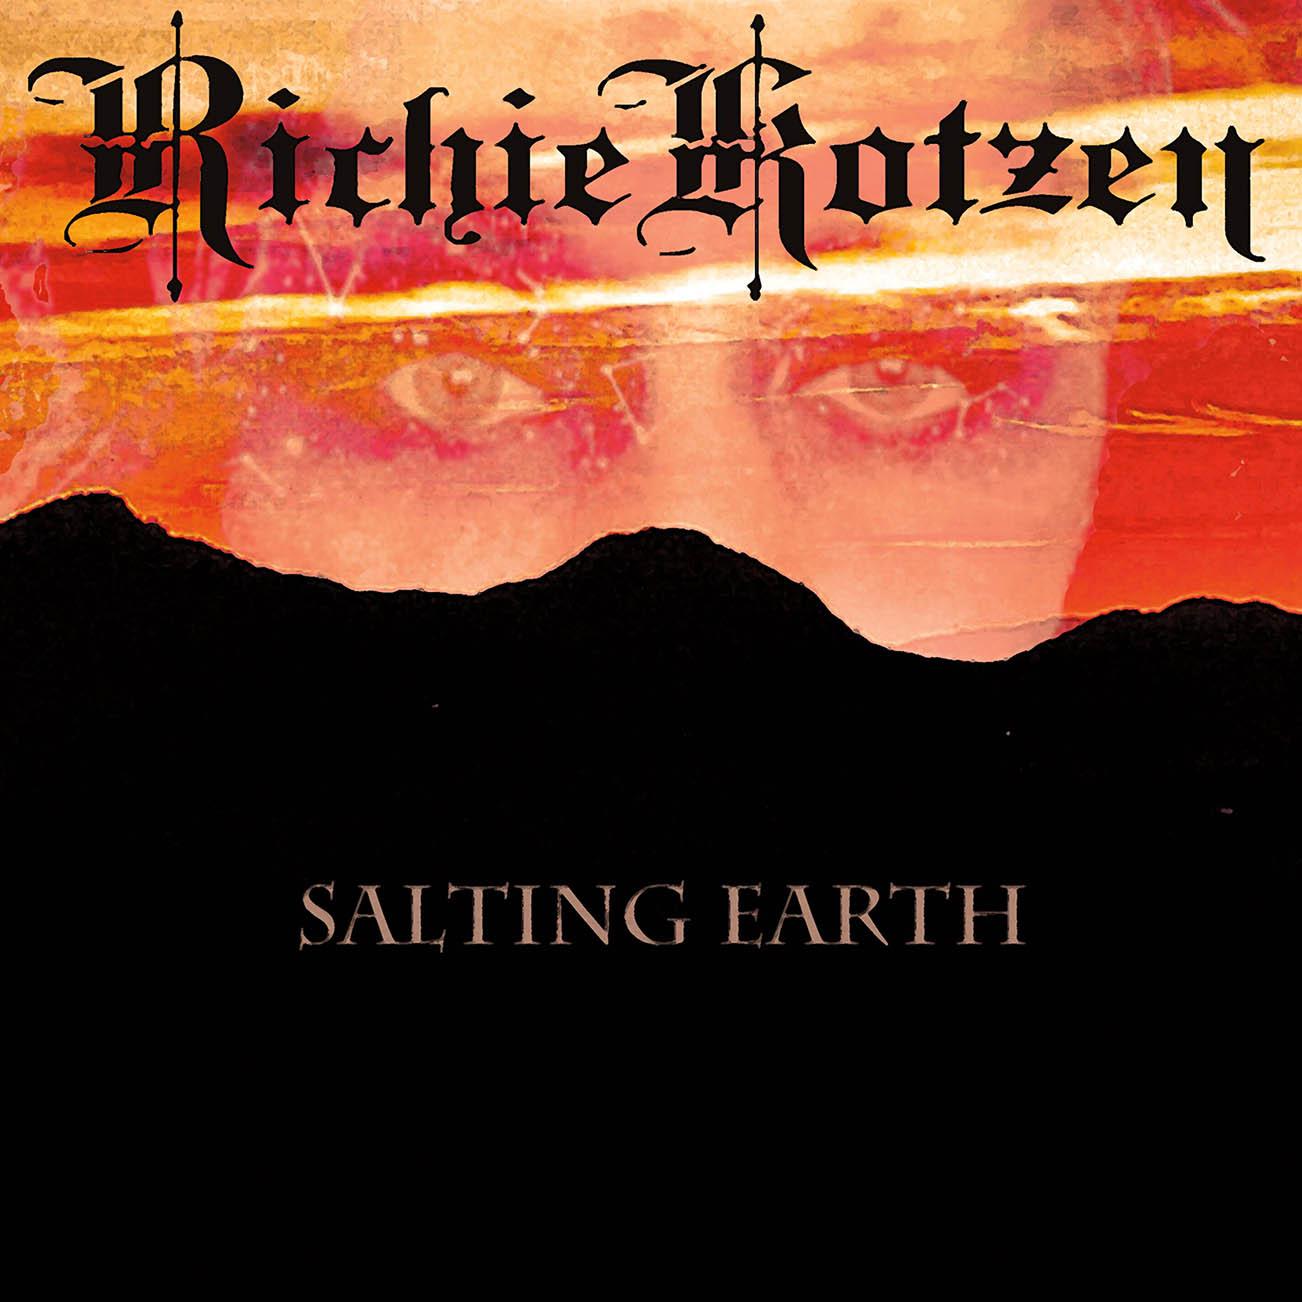 richie_kotzen_salting_earth